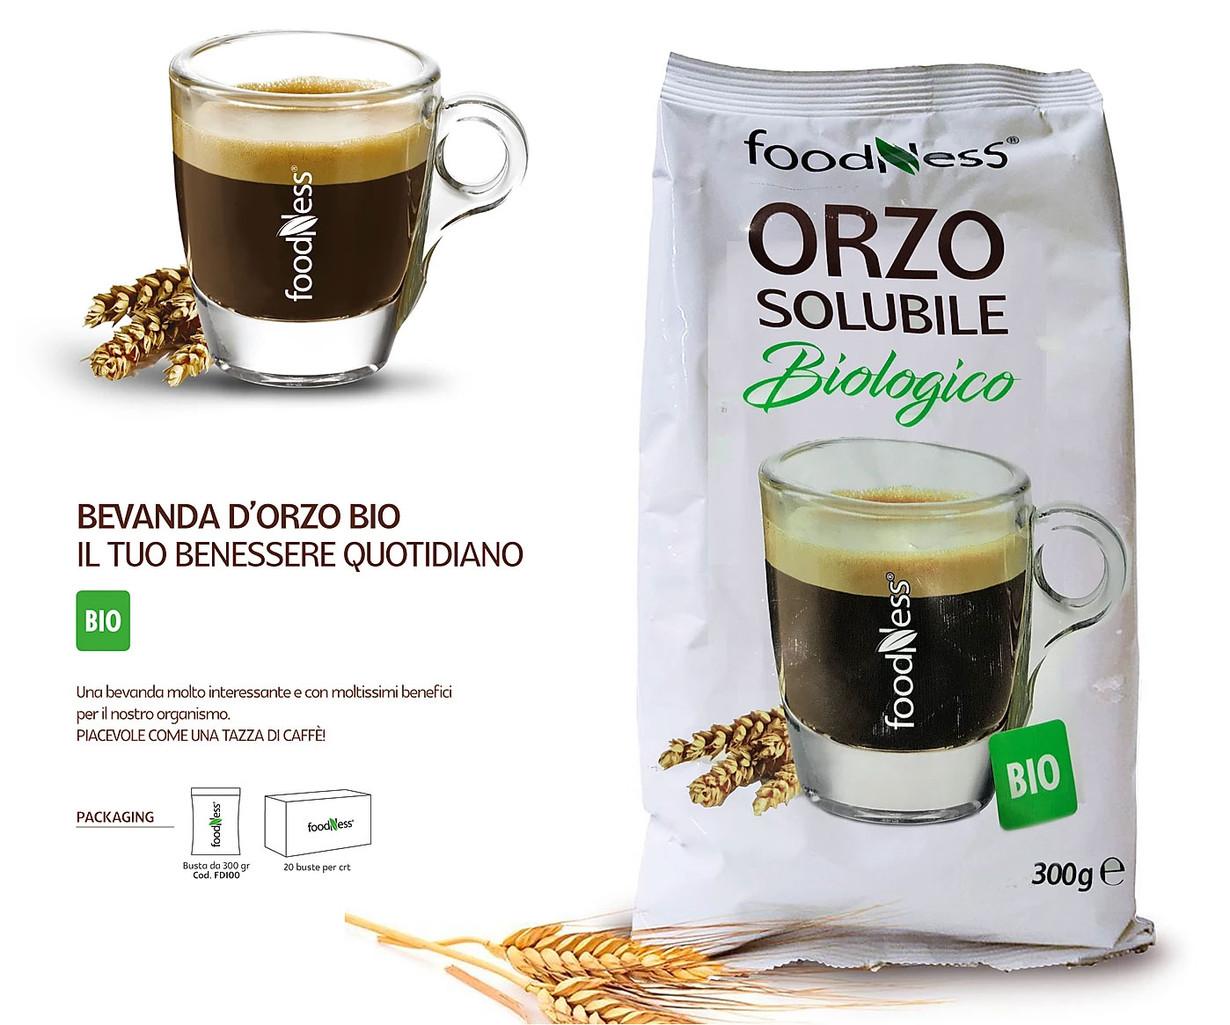 Foodness orzo bio